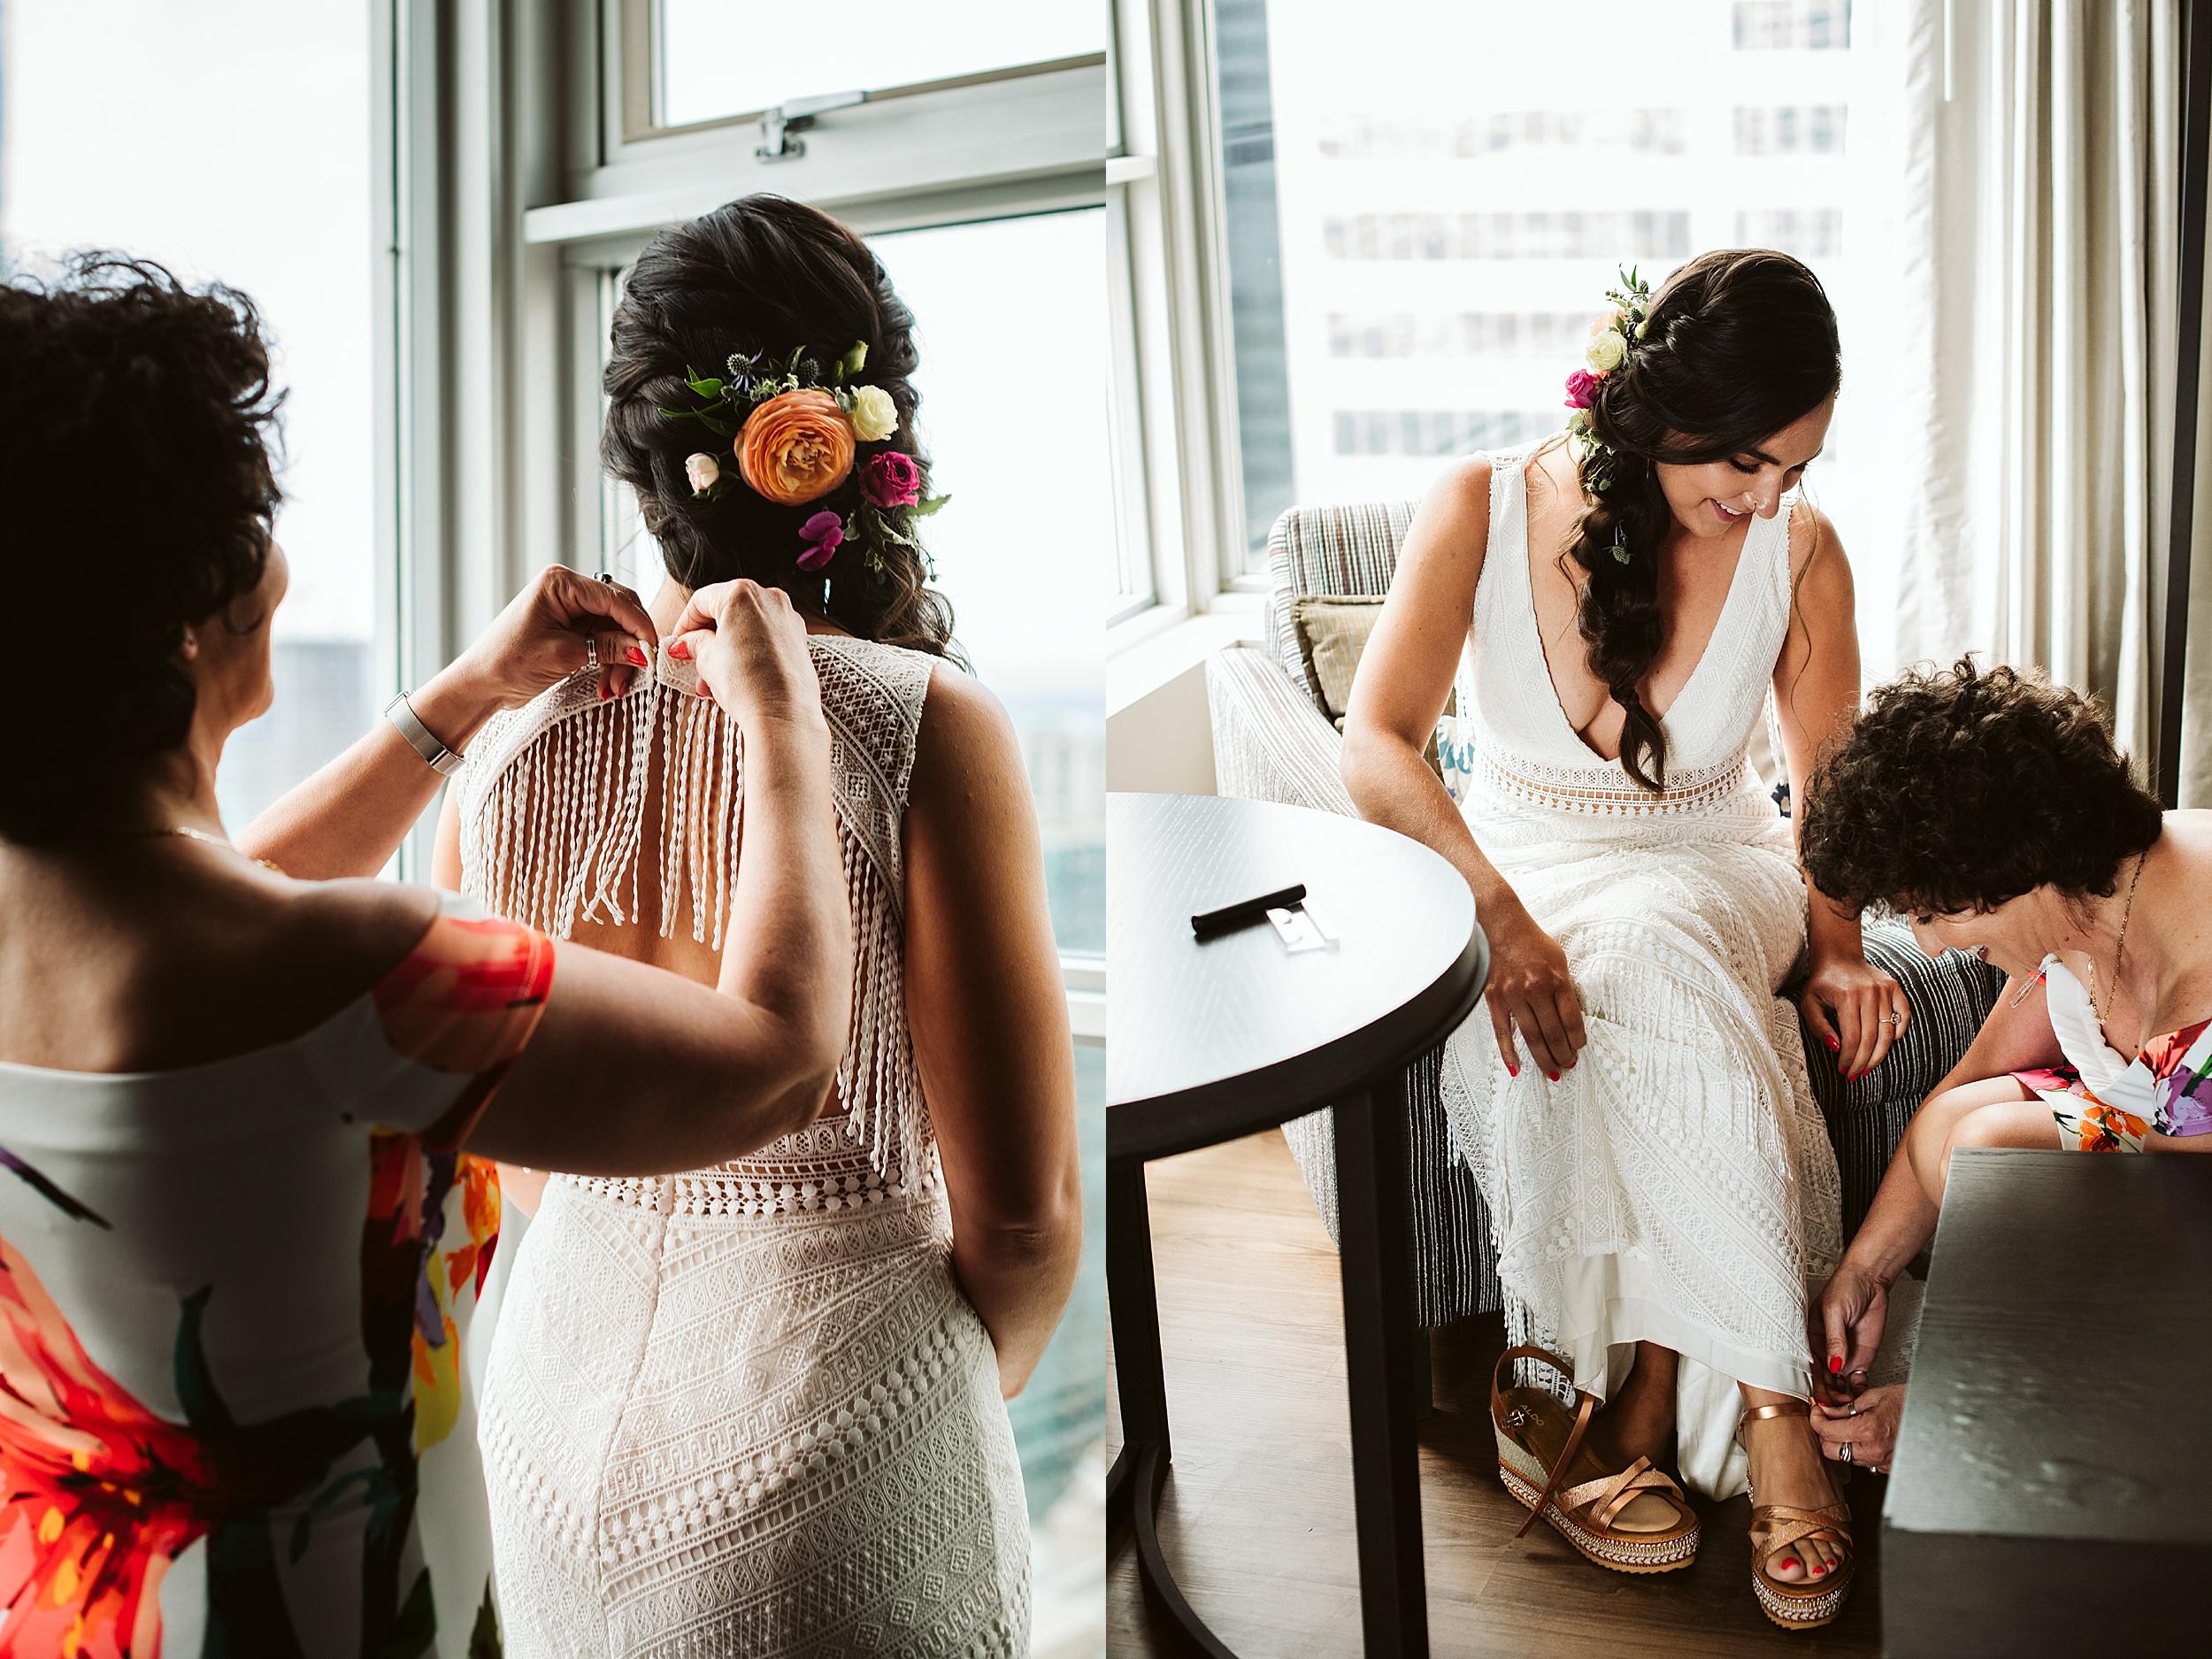 Airship-37-Berkeley-Events-Distillery-District-Wedding-Toronto-Wedding-Photographers_0009.jpg